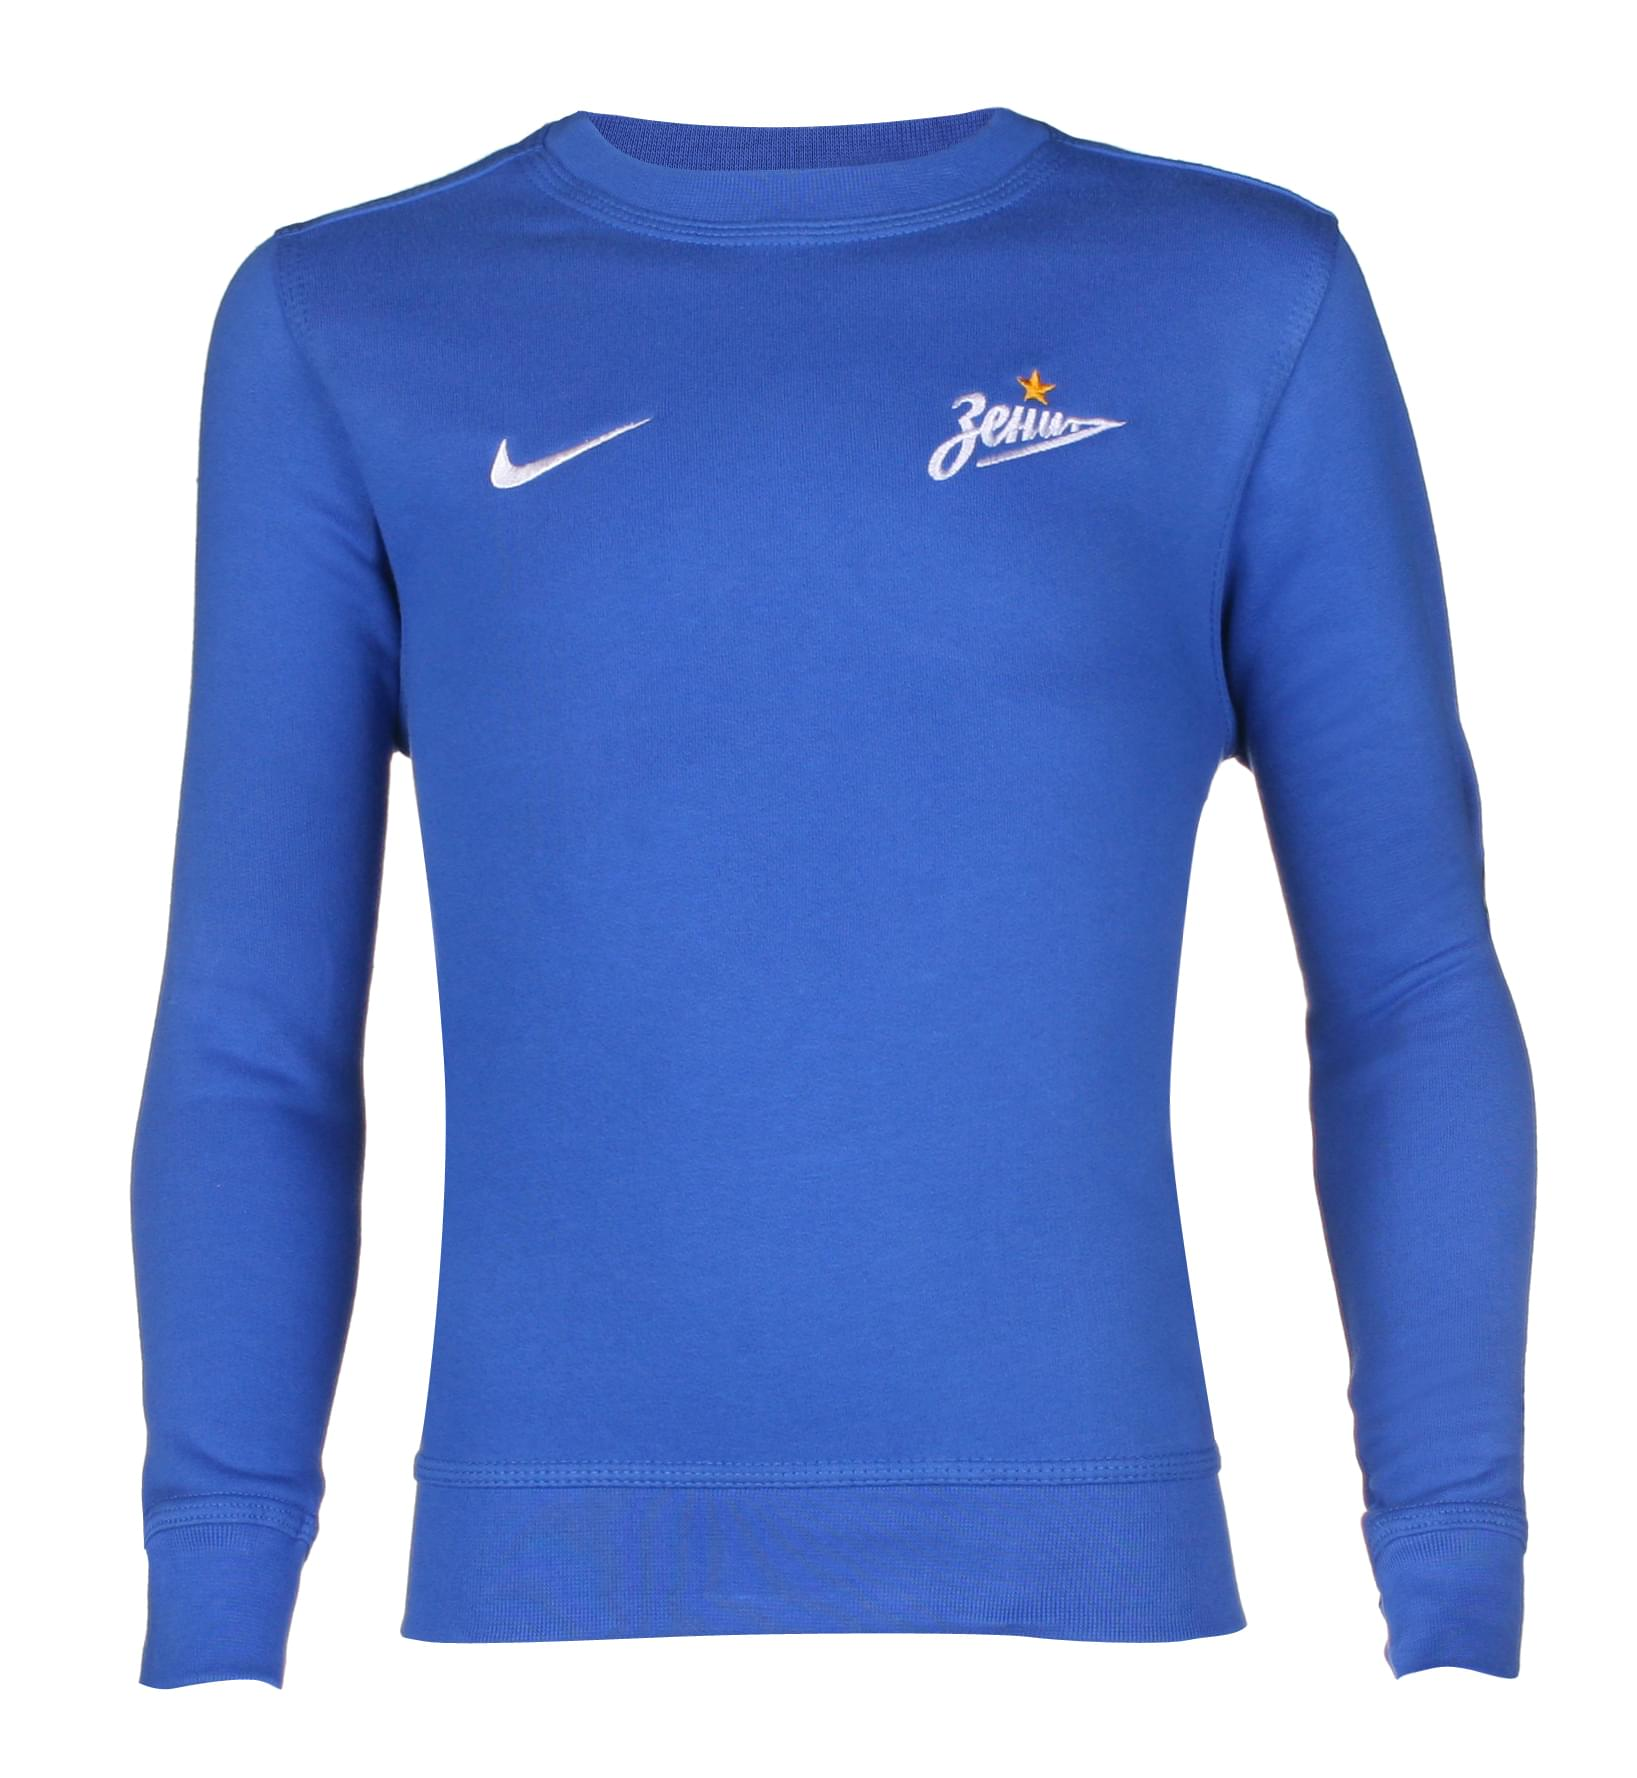 Свитшот подростковый Nike, Цвет-Синий, Размер-S